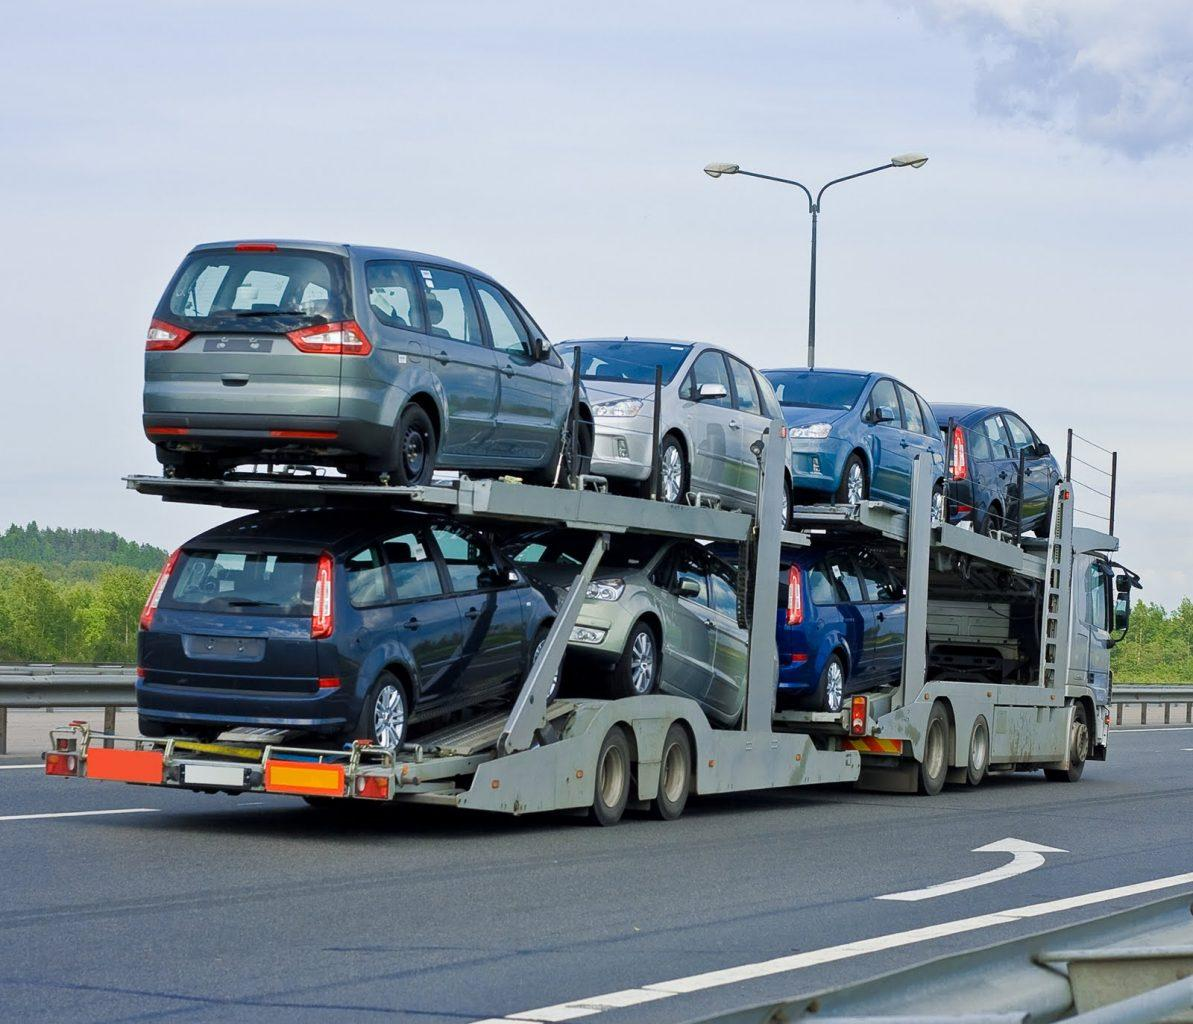 NACIONAL - Diploma que baixa IUC dos carros importados entra em vigor a partir de 1 de Outubro